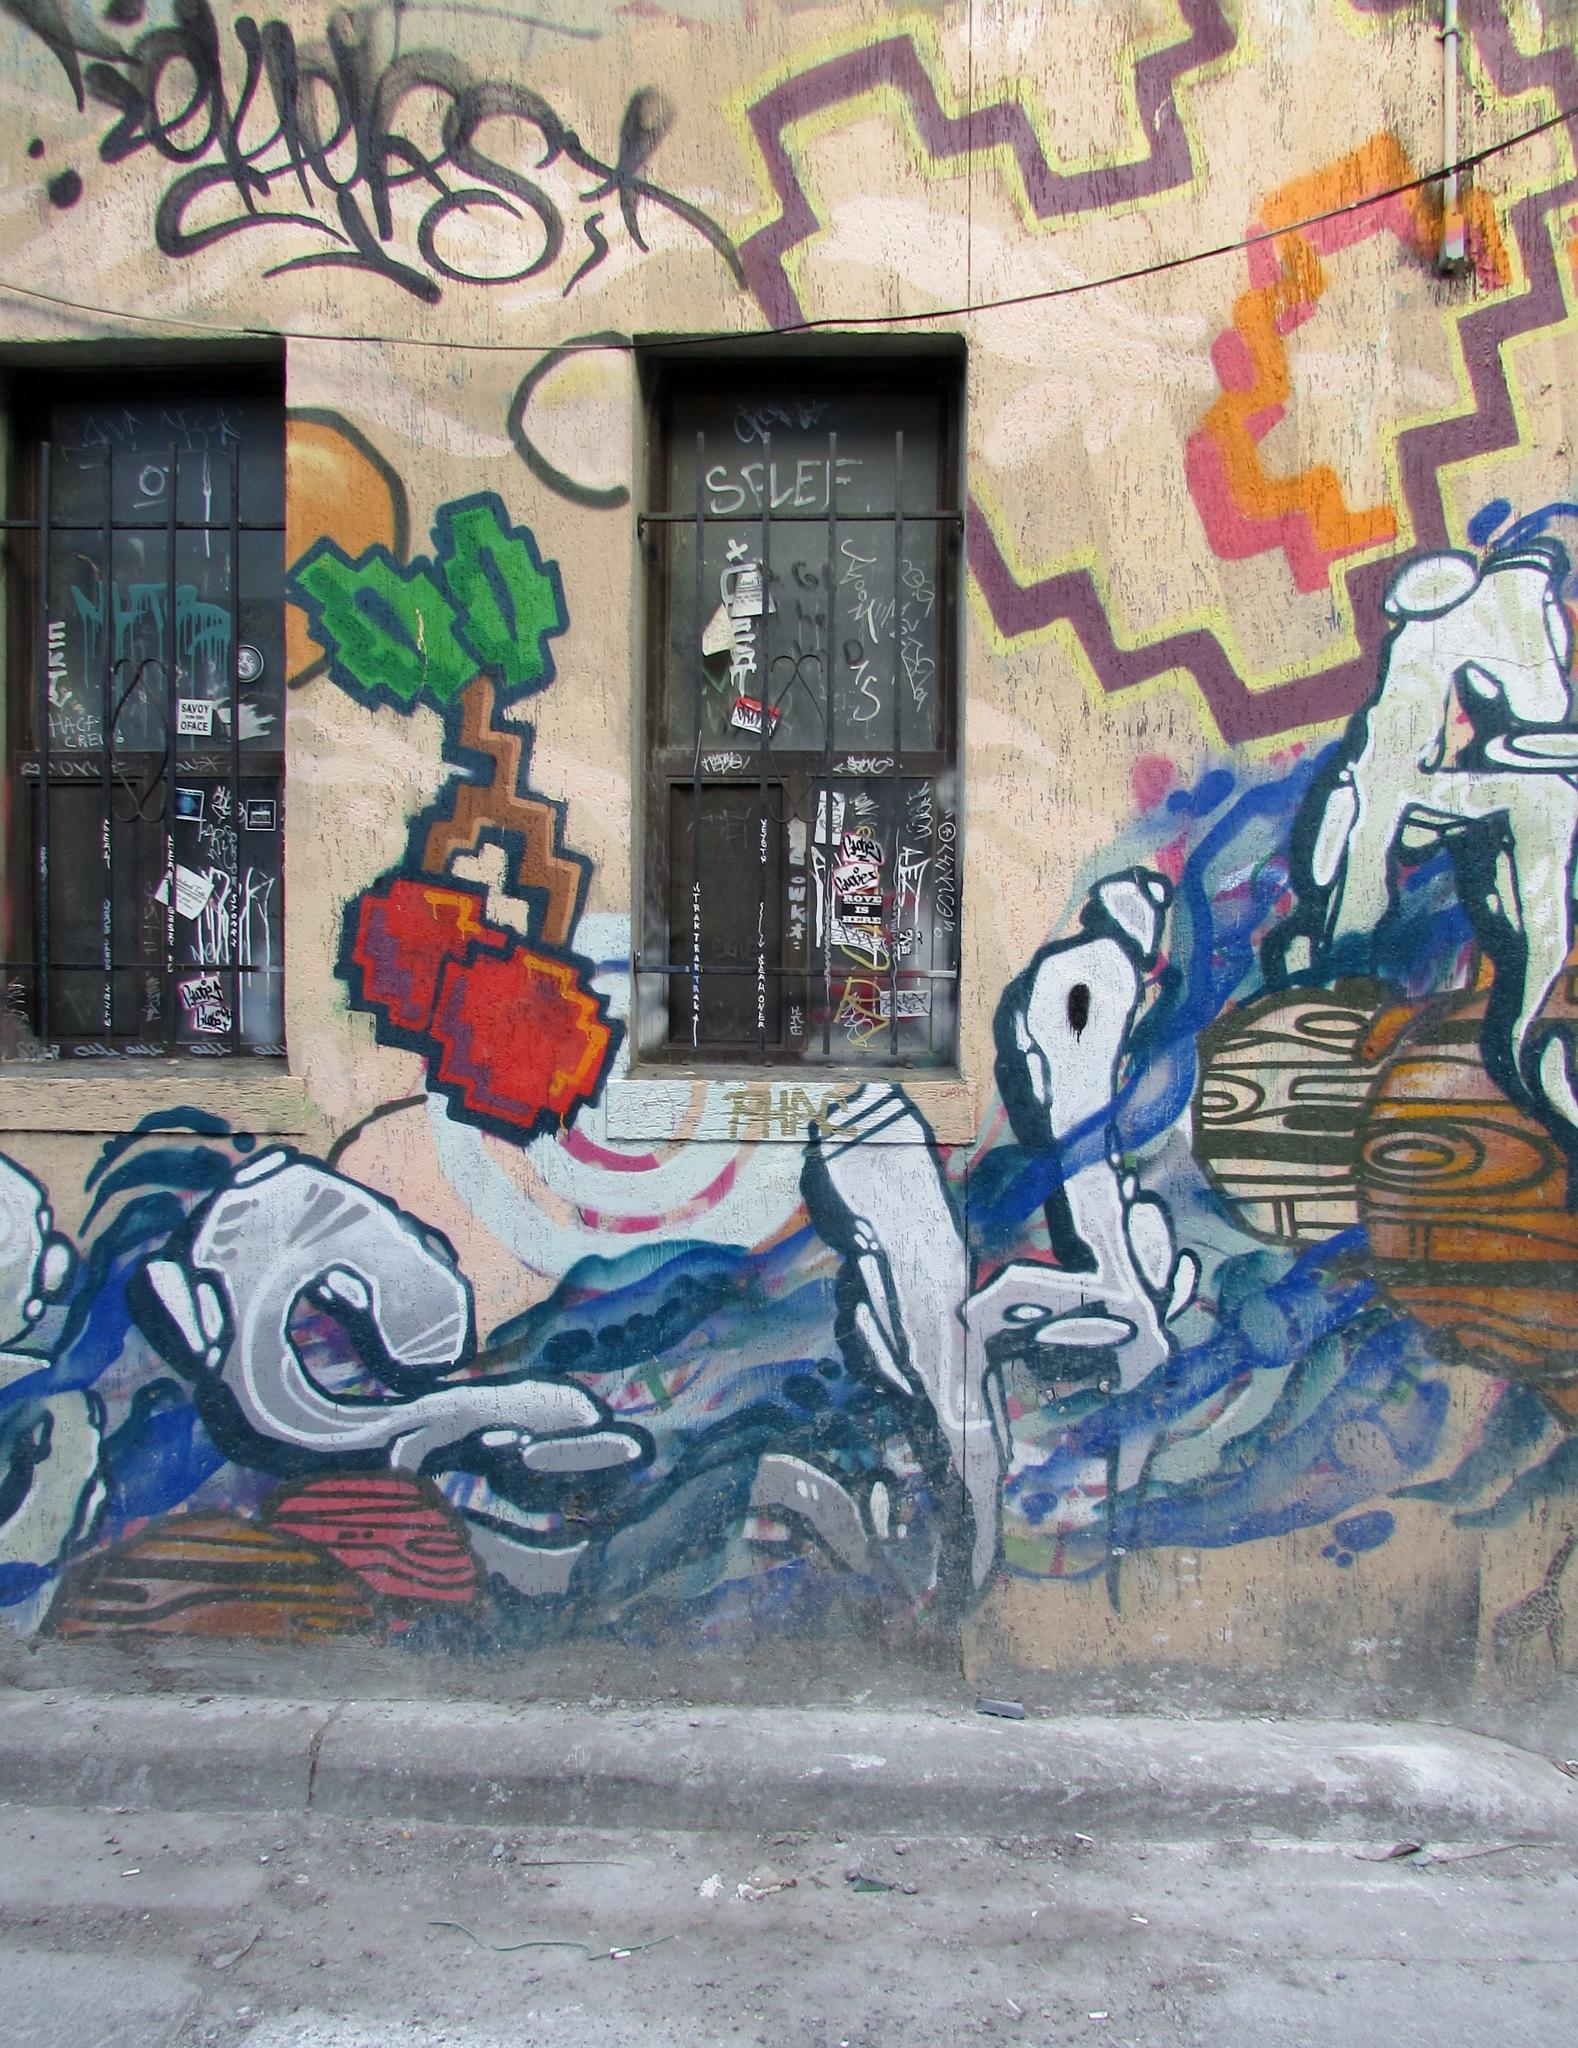 no graffiti by robert butts